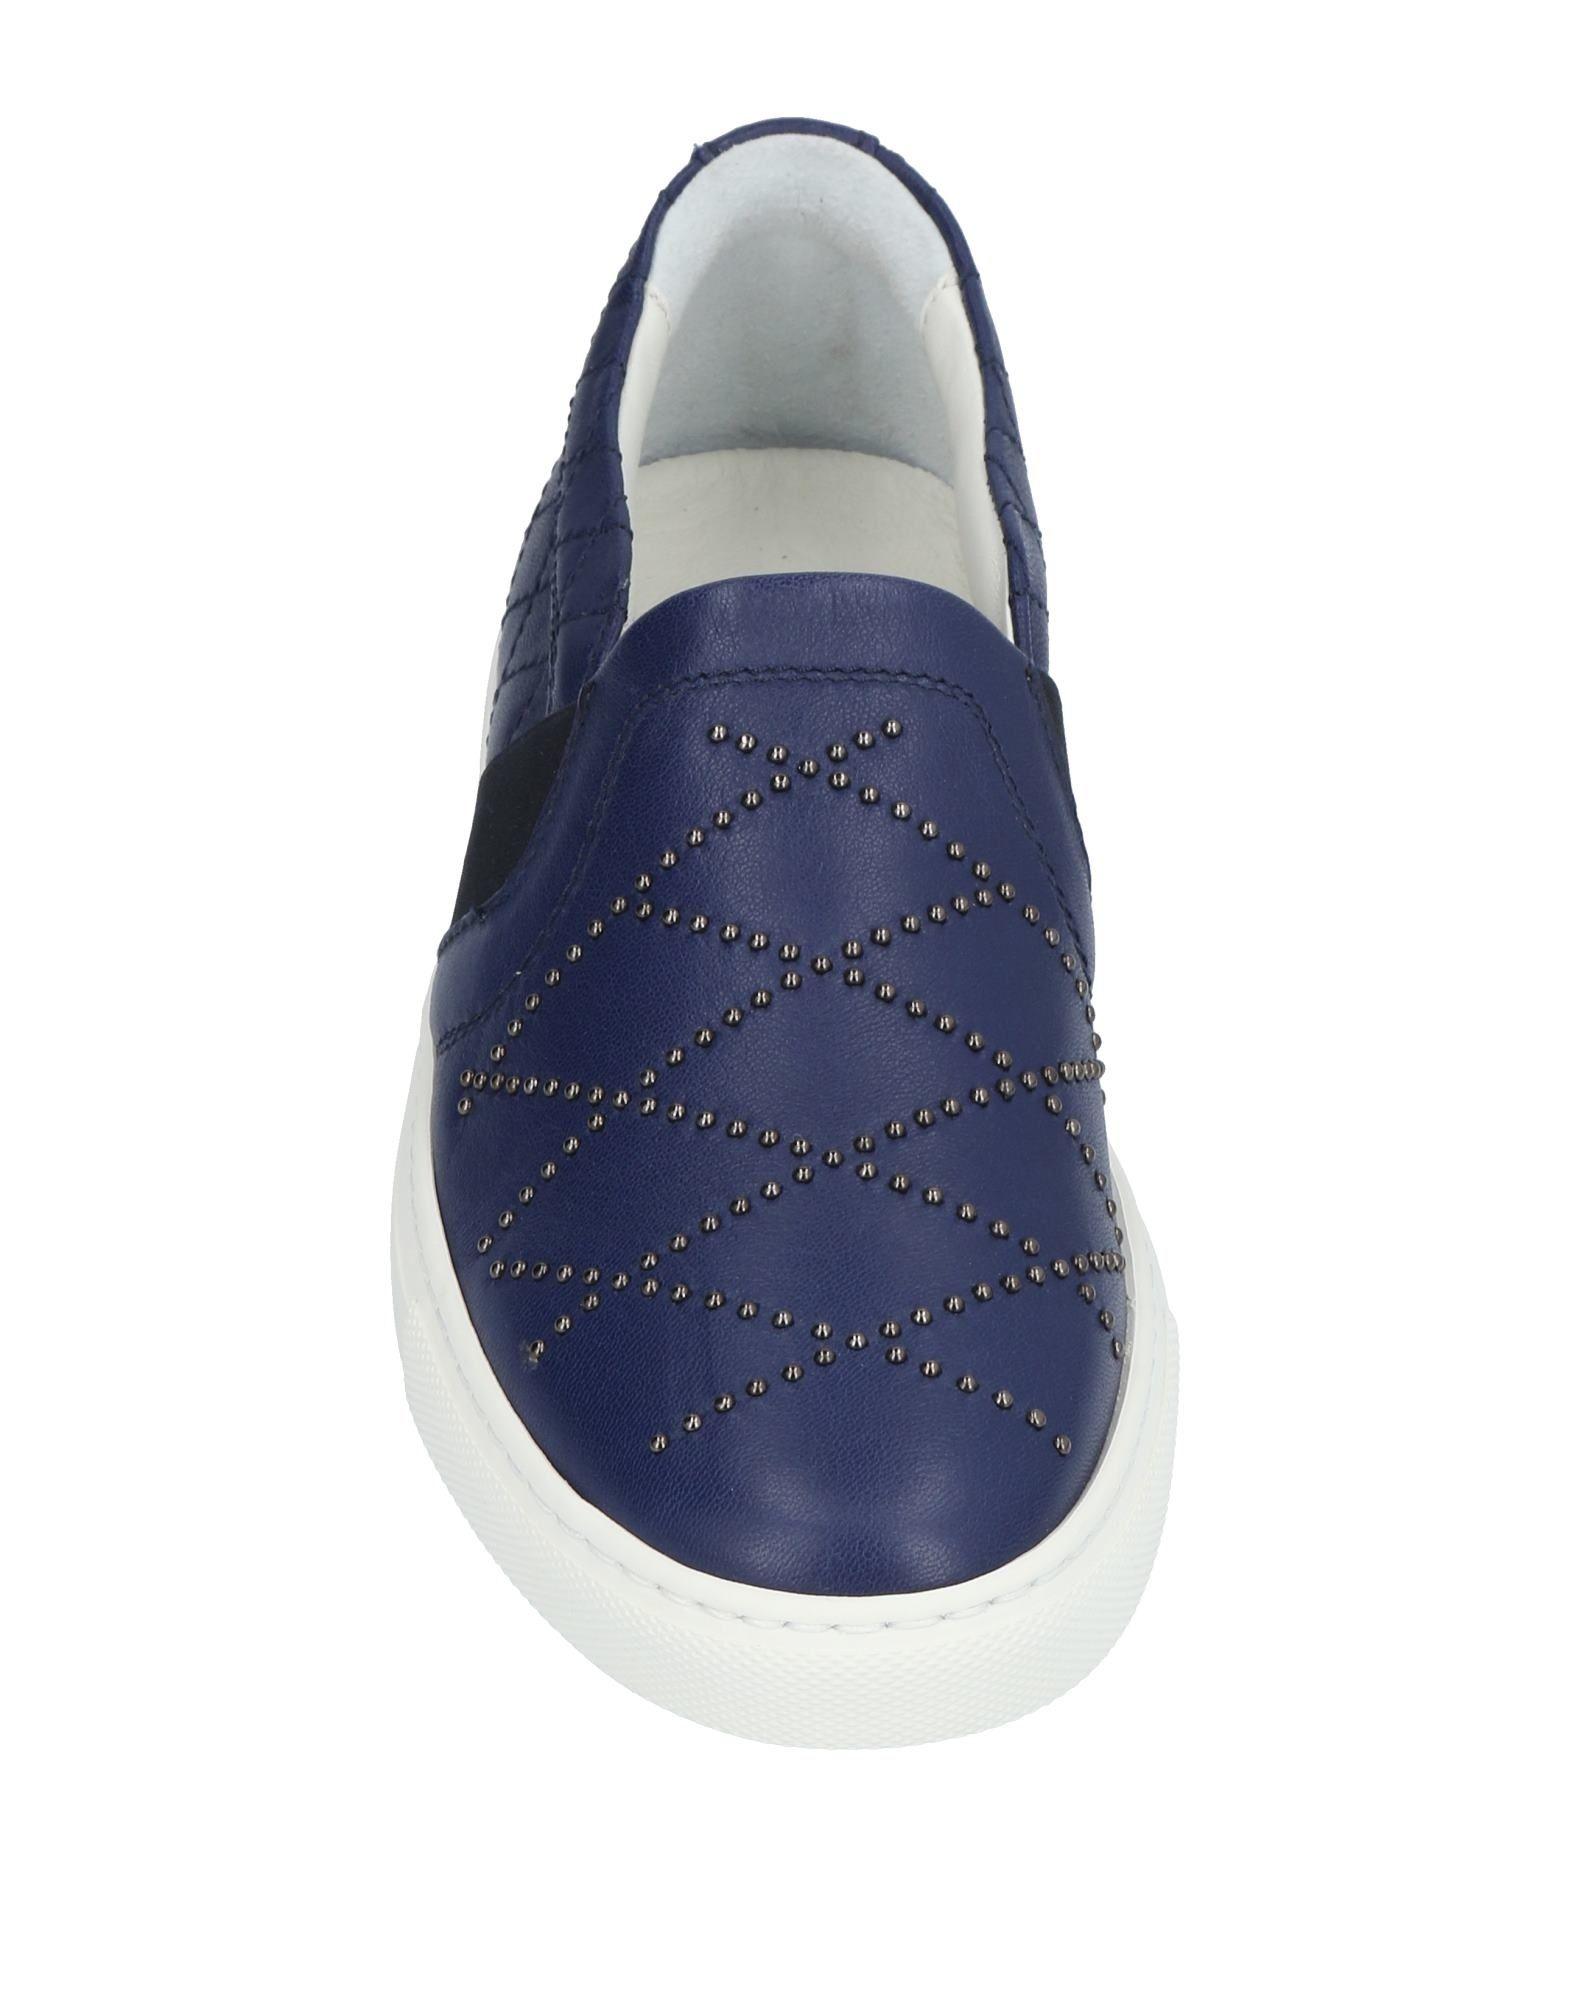 Sneakers Lanvin Femme - Sneakers Lanvin sur